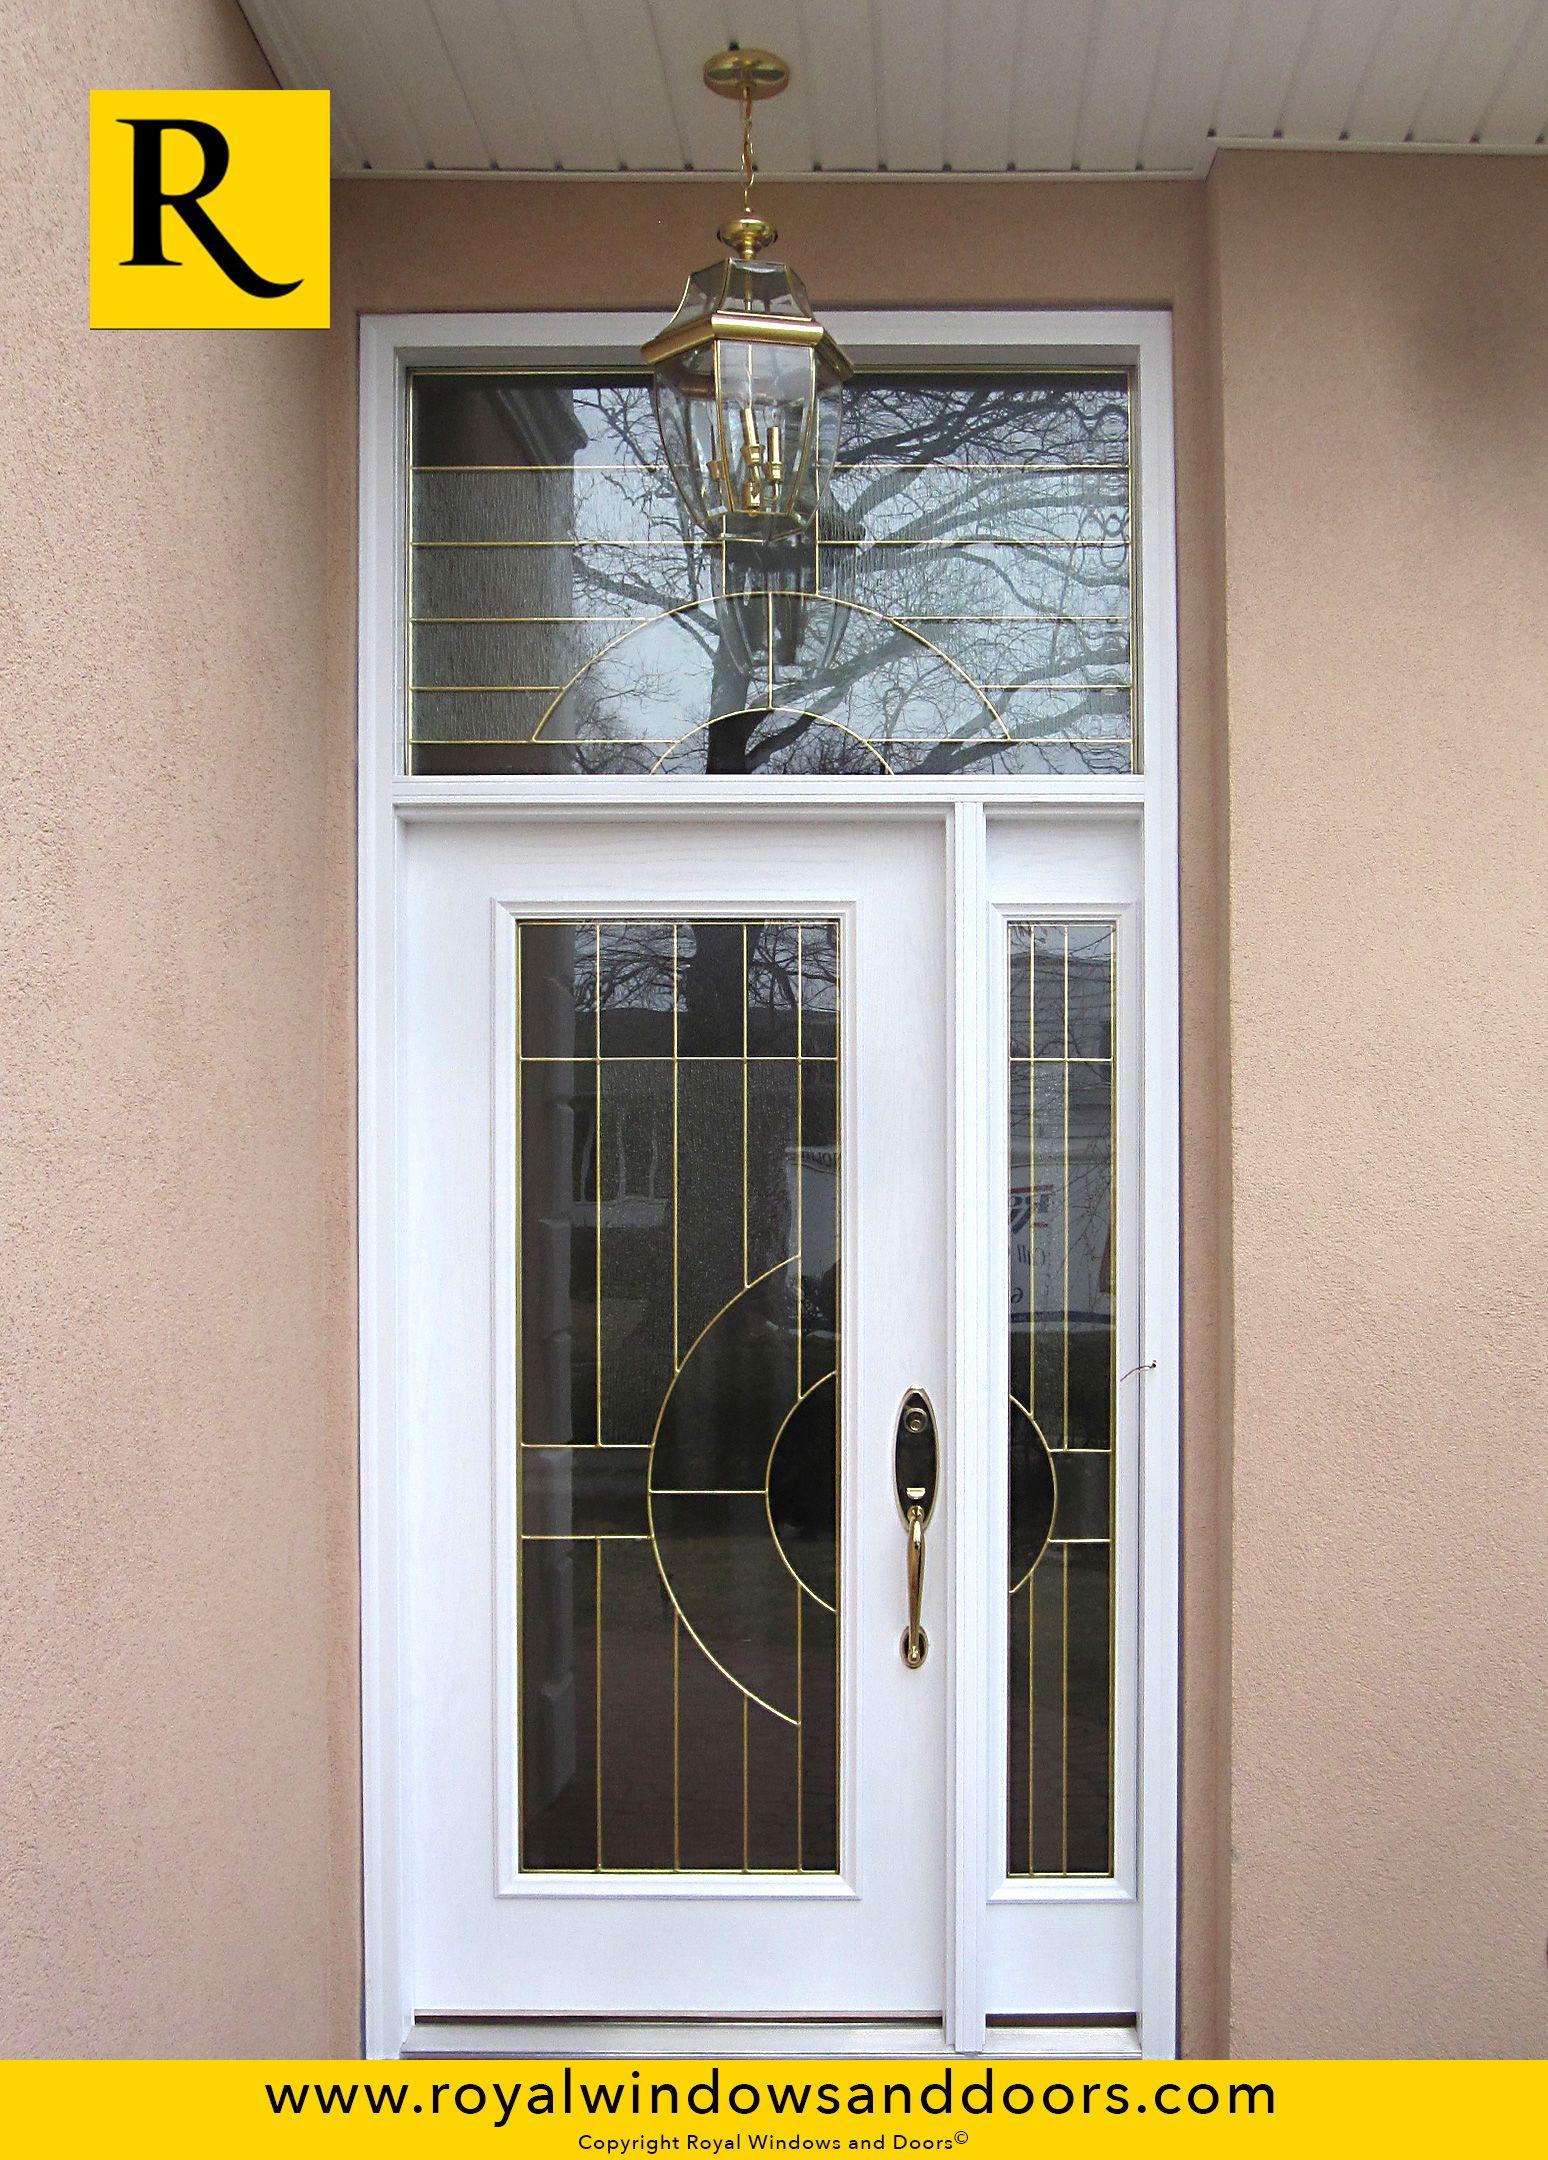 Single entry door in white color designer glass one side lite single entry door in white color designer glass one side lite transom eventshaper